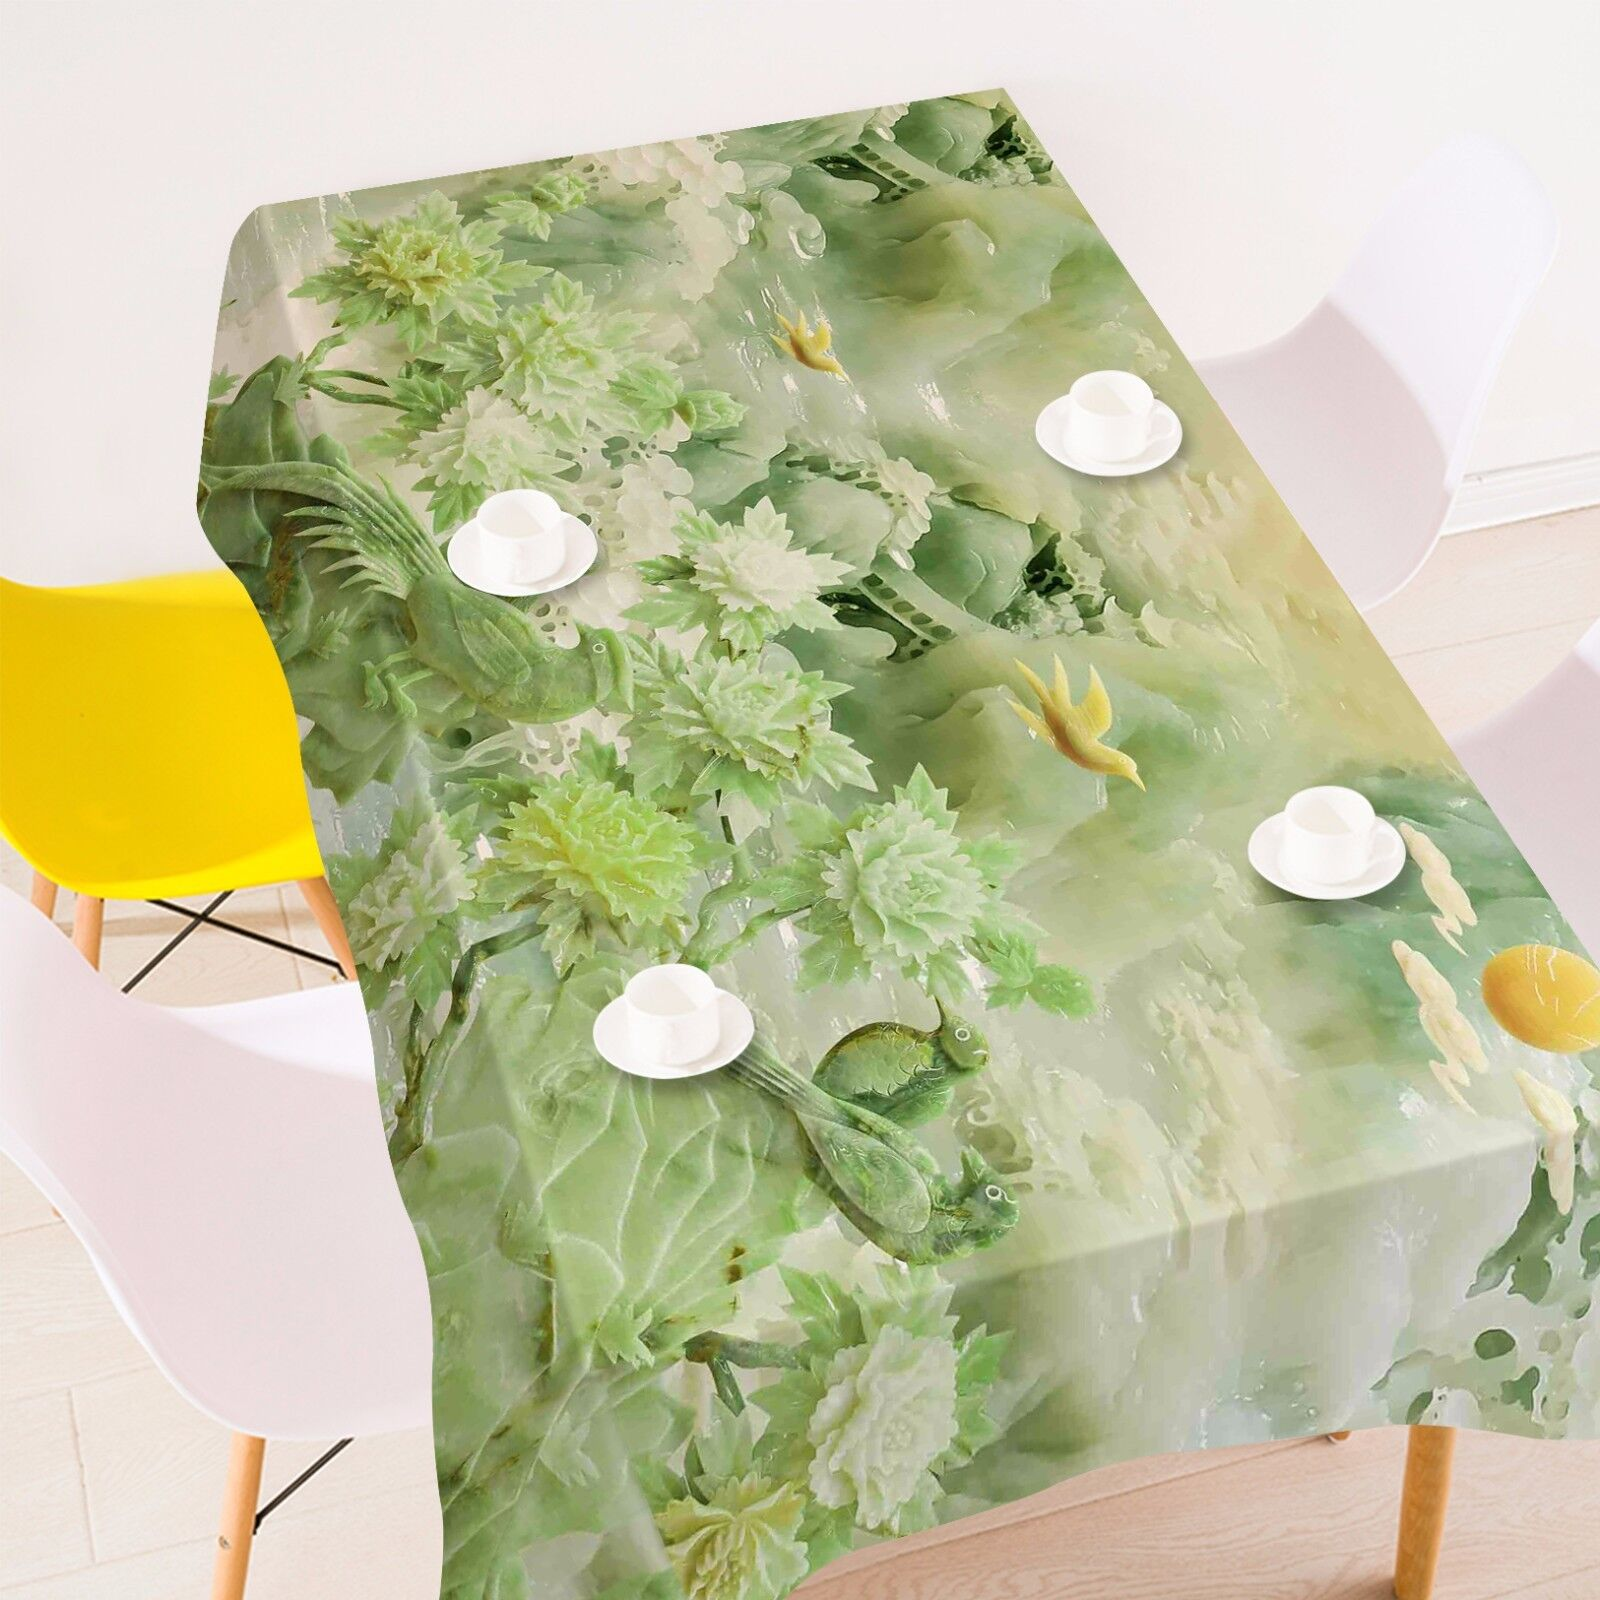 3D Grün 46 Tablecloth Table Cover Cloth Birthday Birthday Birthday Party AJ WALLPAPER UK Lemon 8184d7